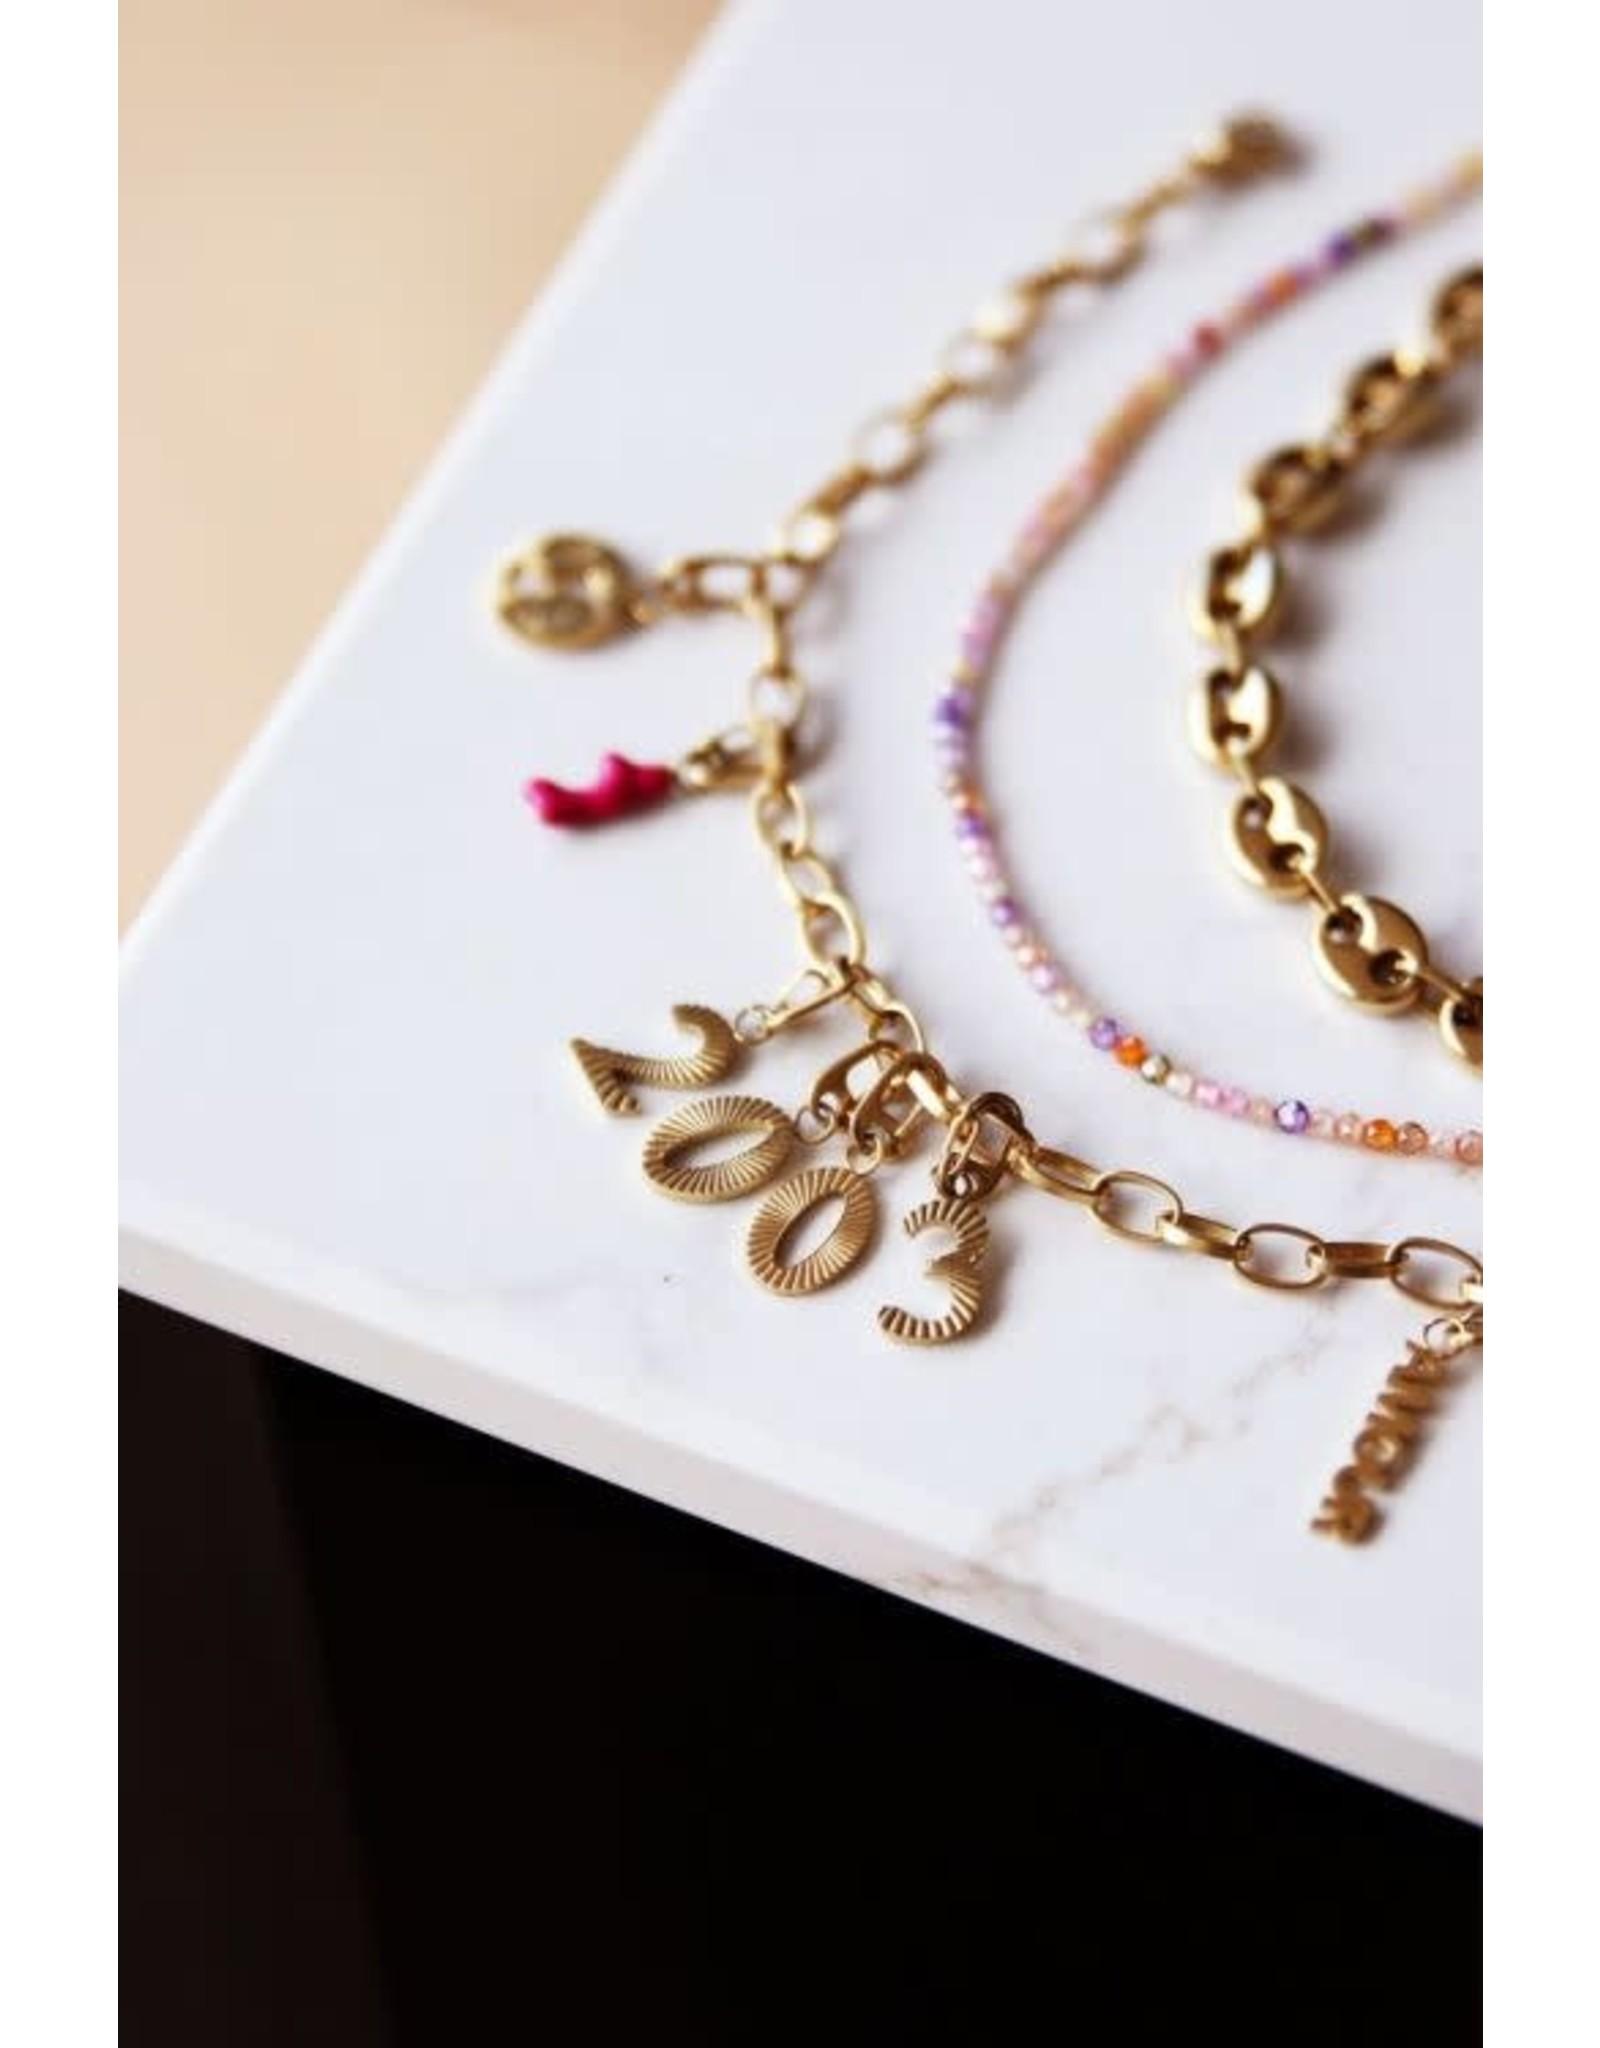 My Jewellery My Jewellery moments getal